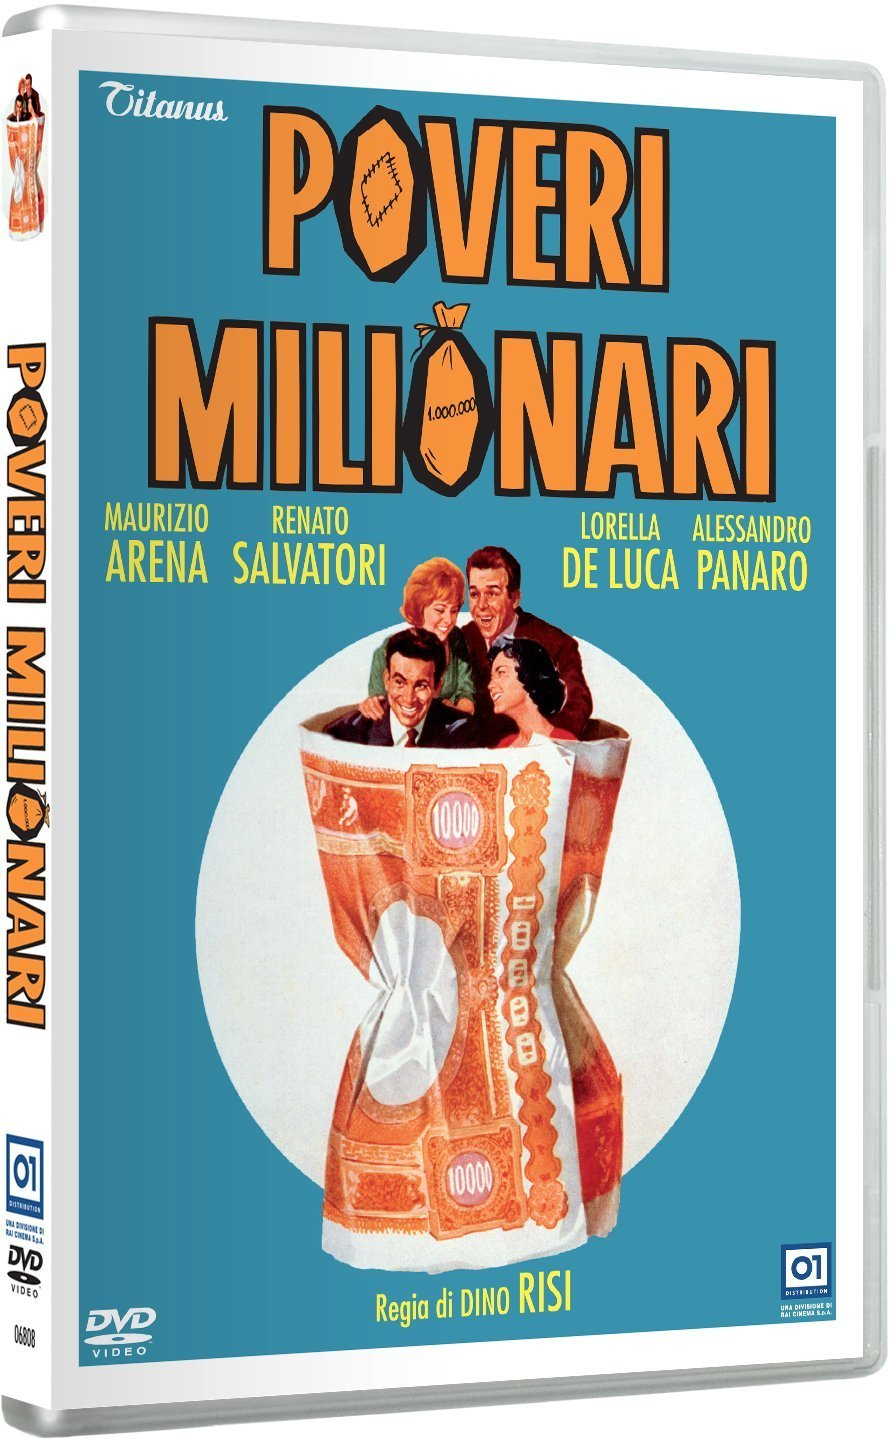 POVERI MILIONARI - RMX (DVD)